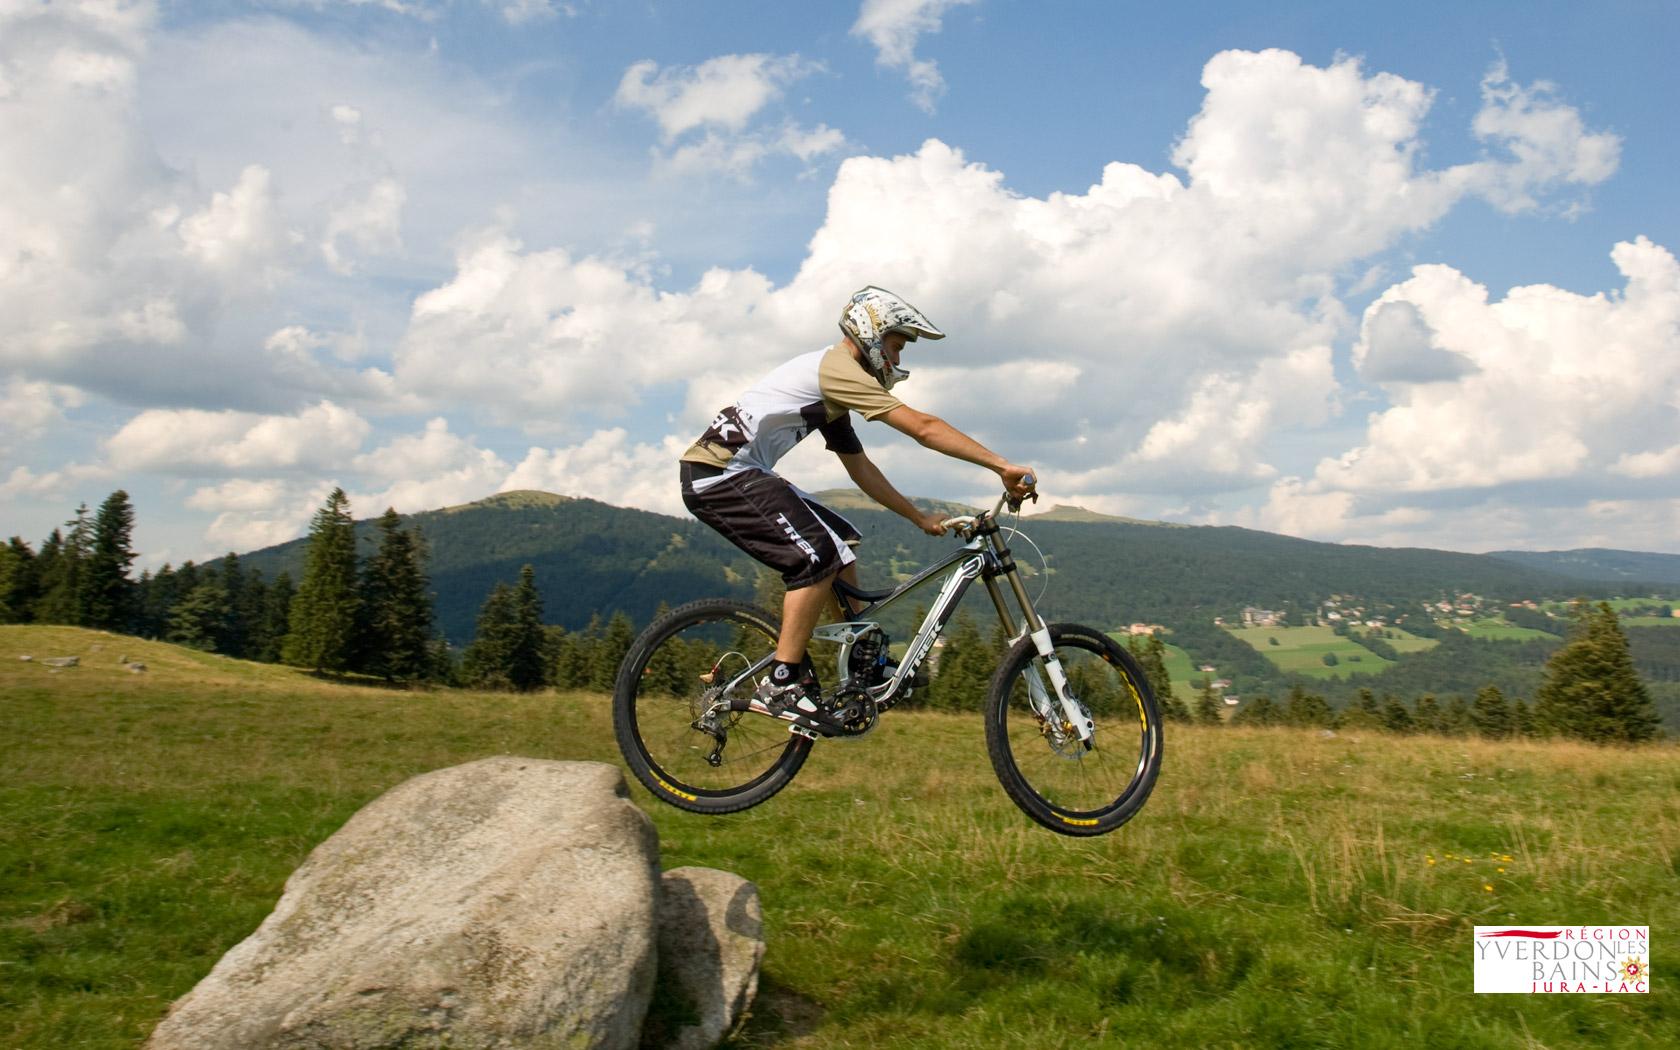 Les Rasses Switzerland  city photos : ... , travels and excursions in Switzerland Sainte Croix/Les Rasses